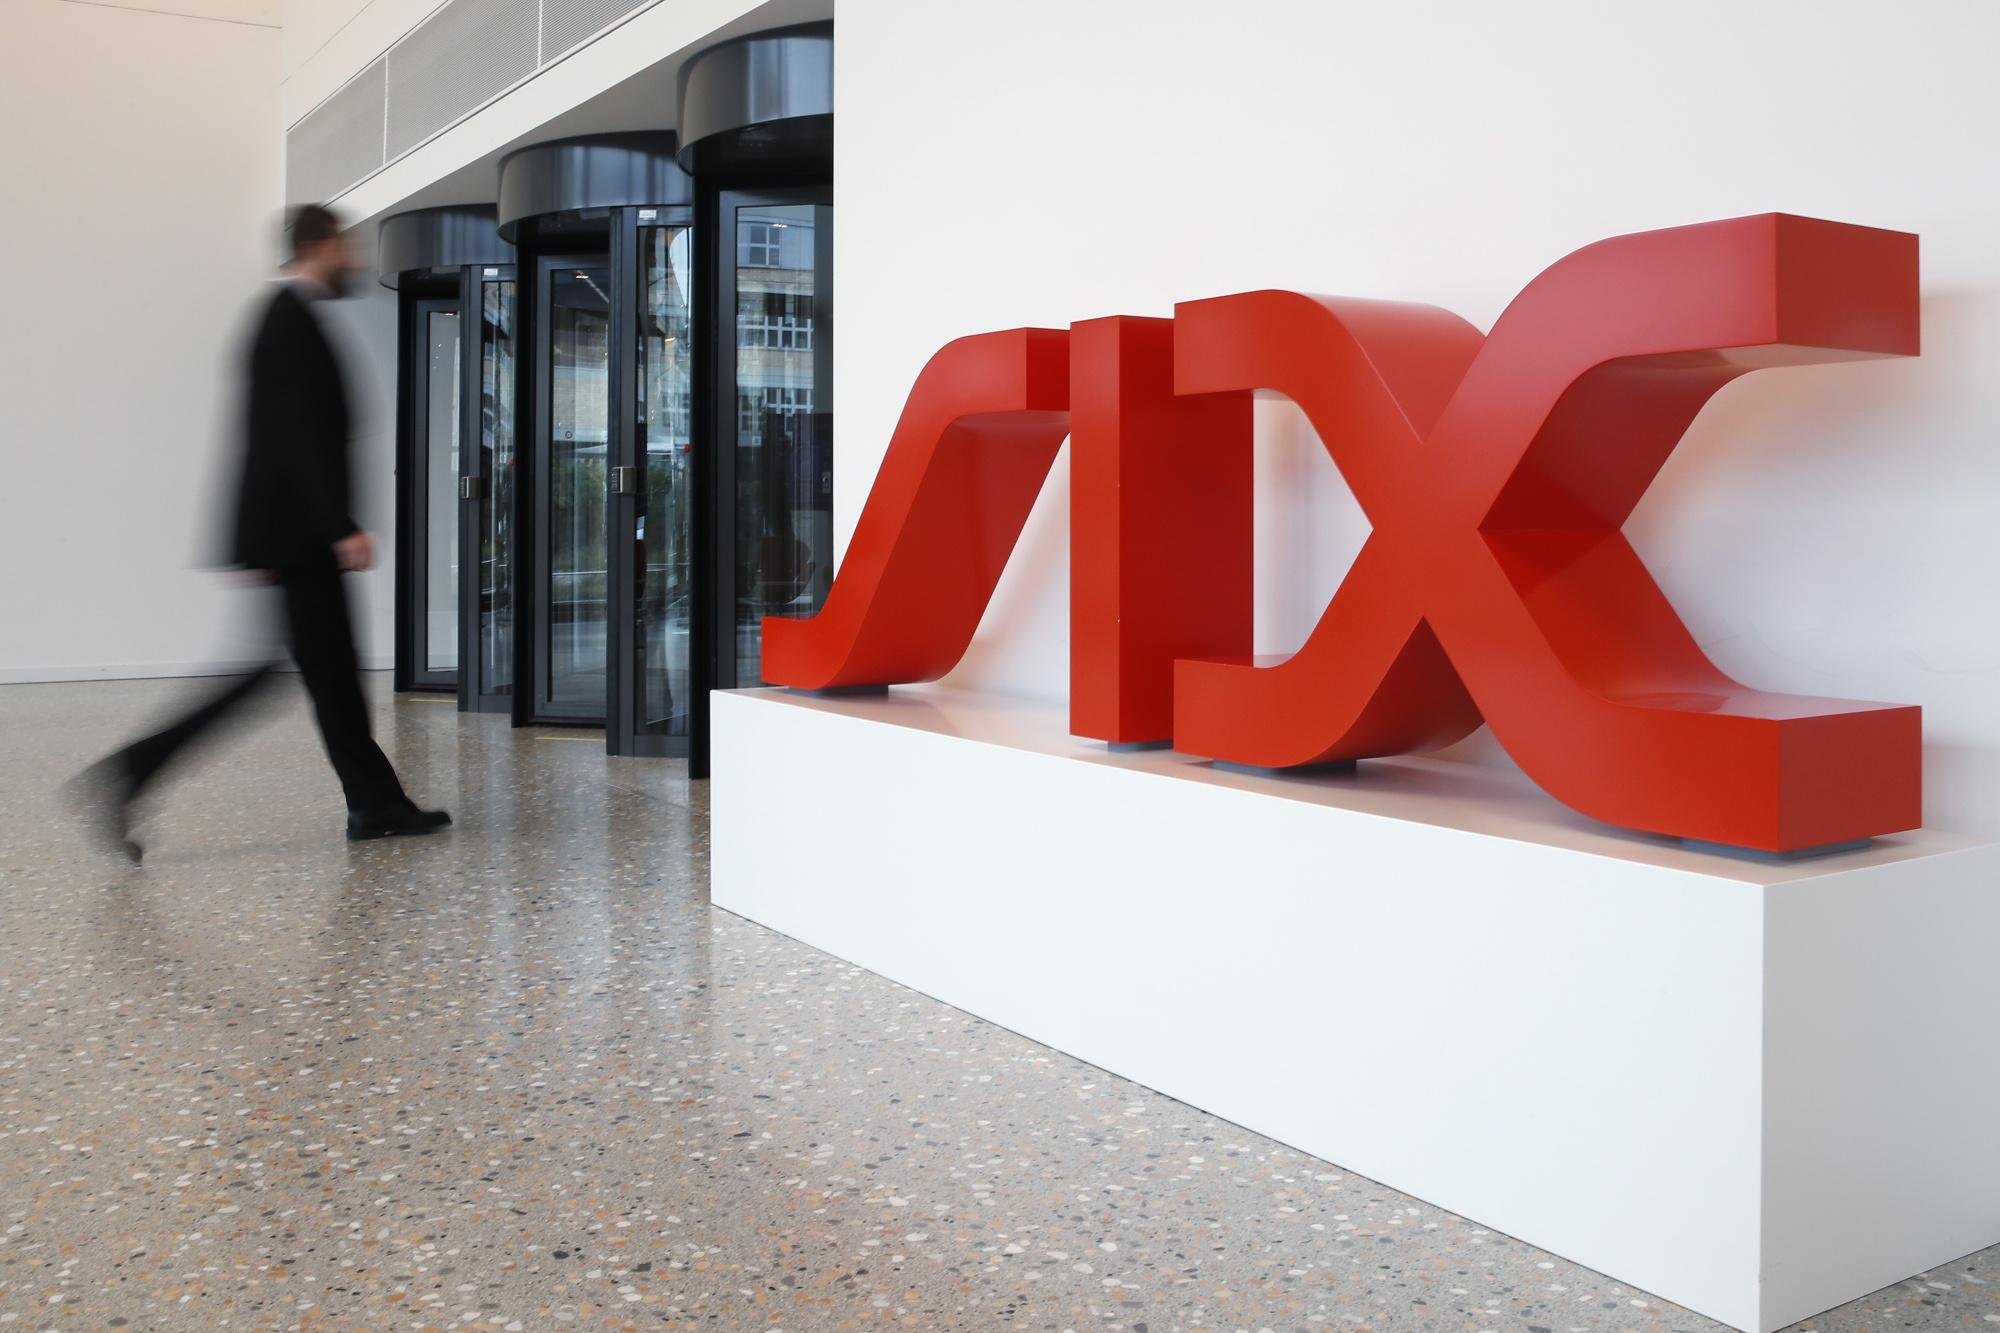 SIX: دو سوم معاملهگران به رمز ارزها علاقه پیدا کردهاند